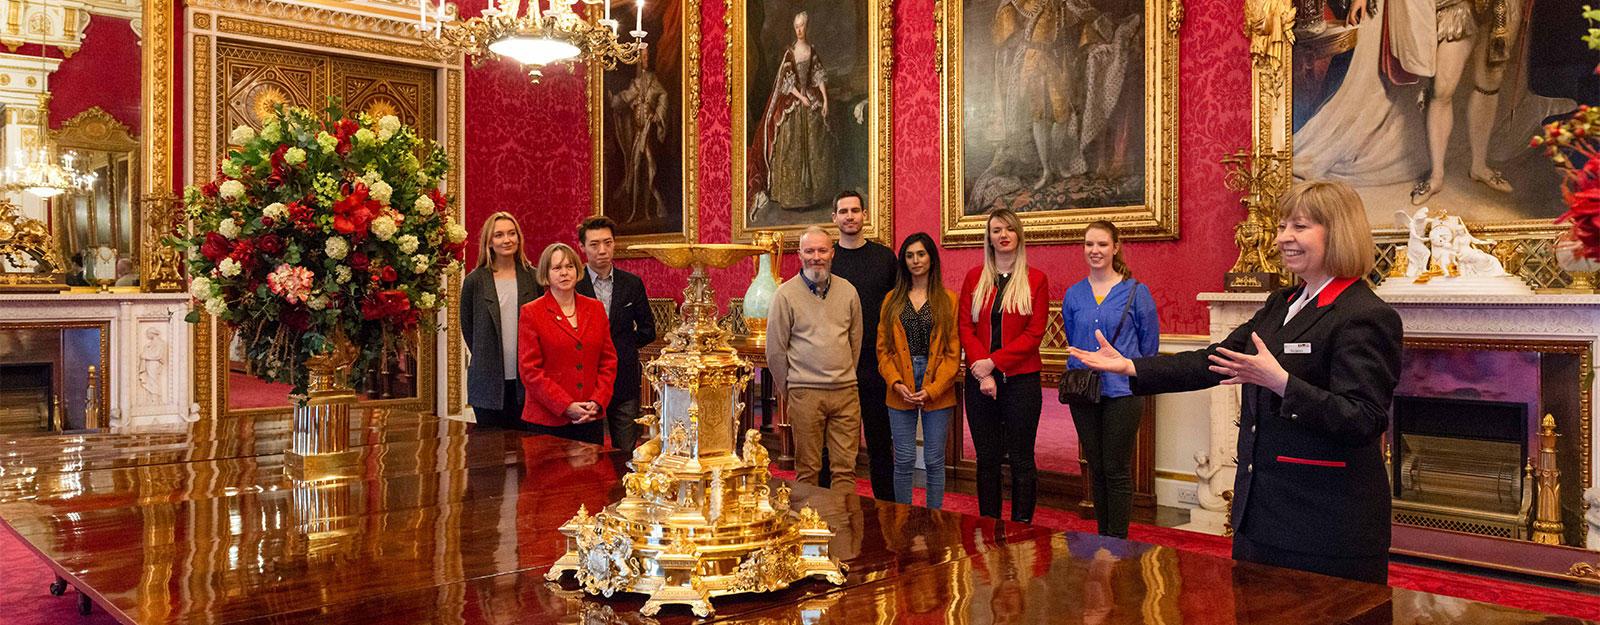 Exclusive evening tour - Buckingham Palace